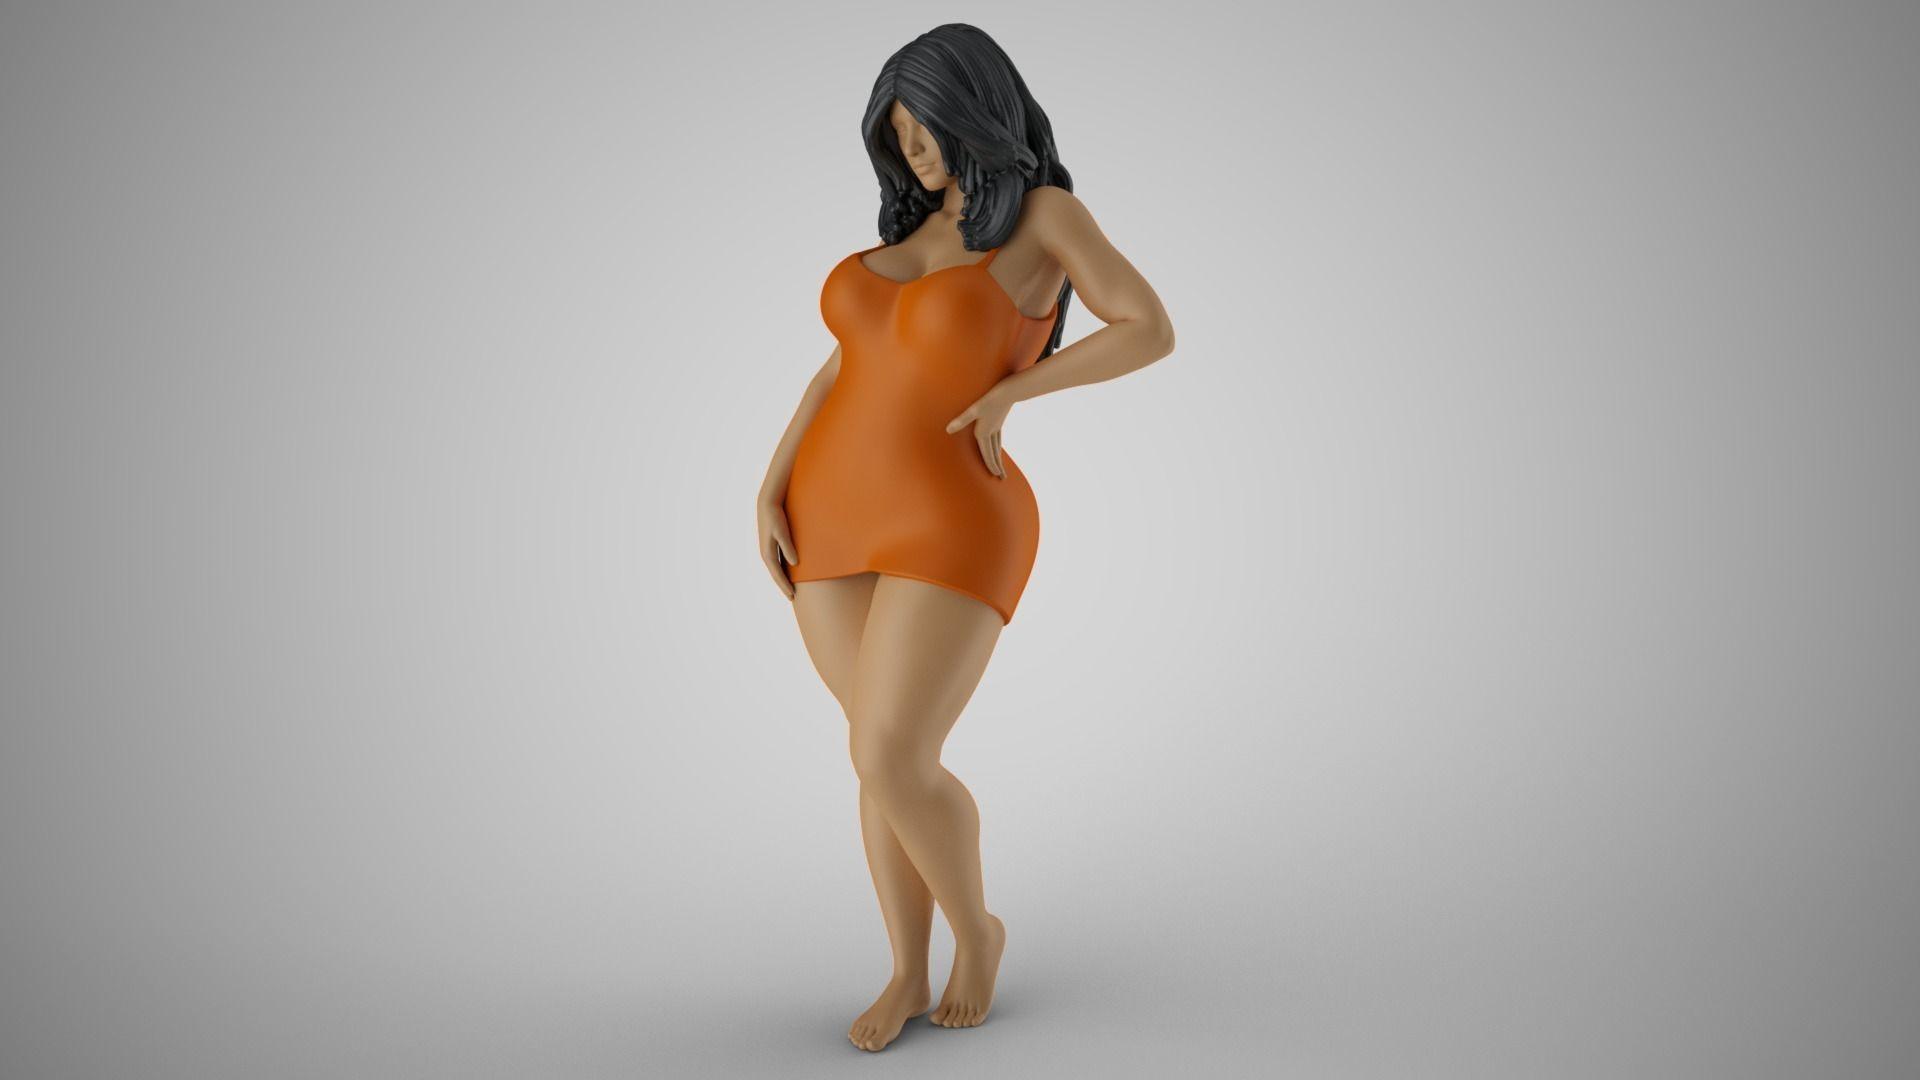 Confident Woman 2